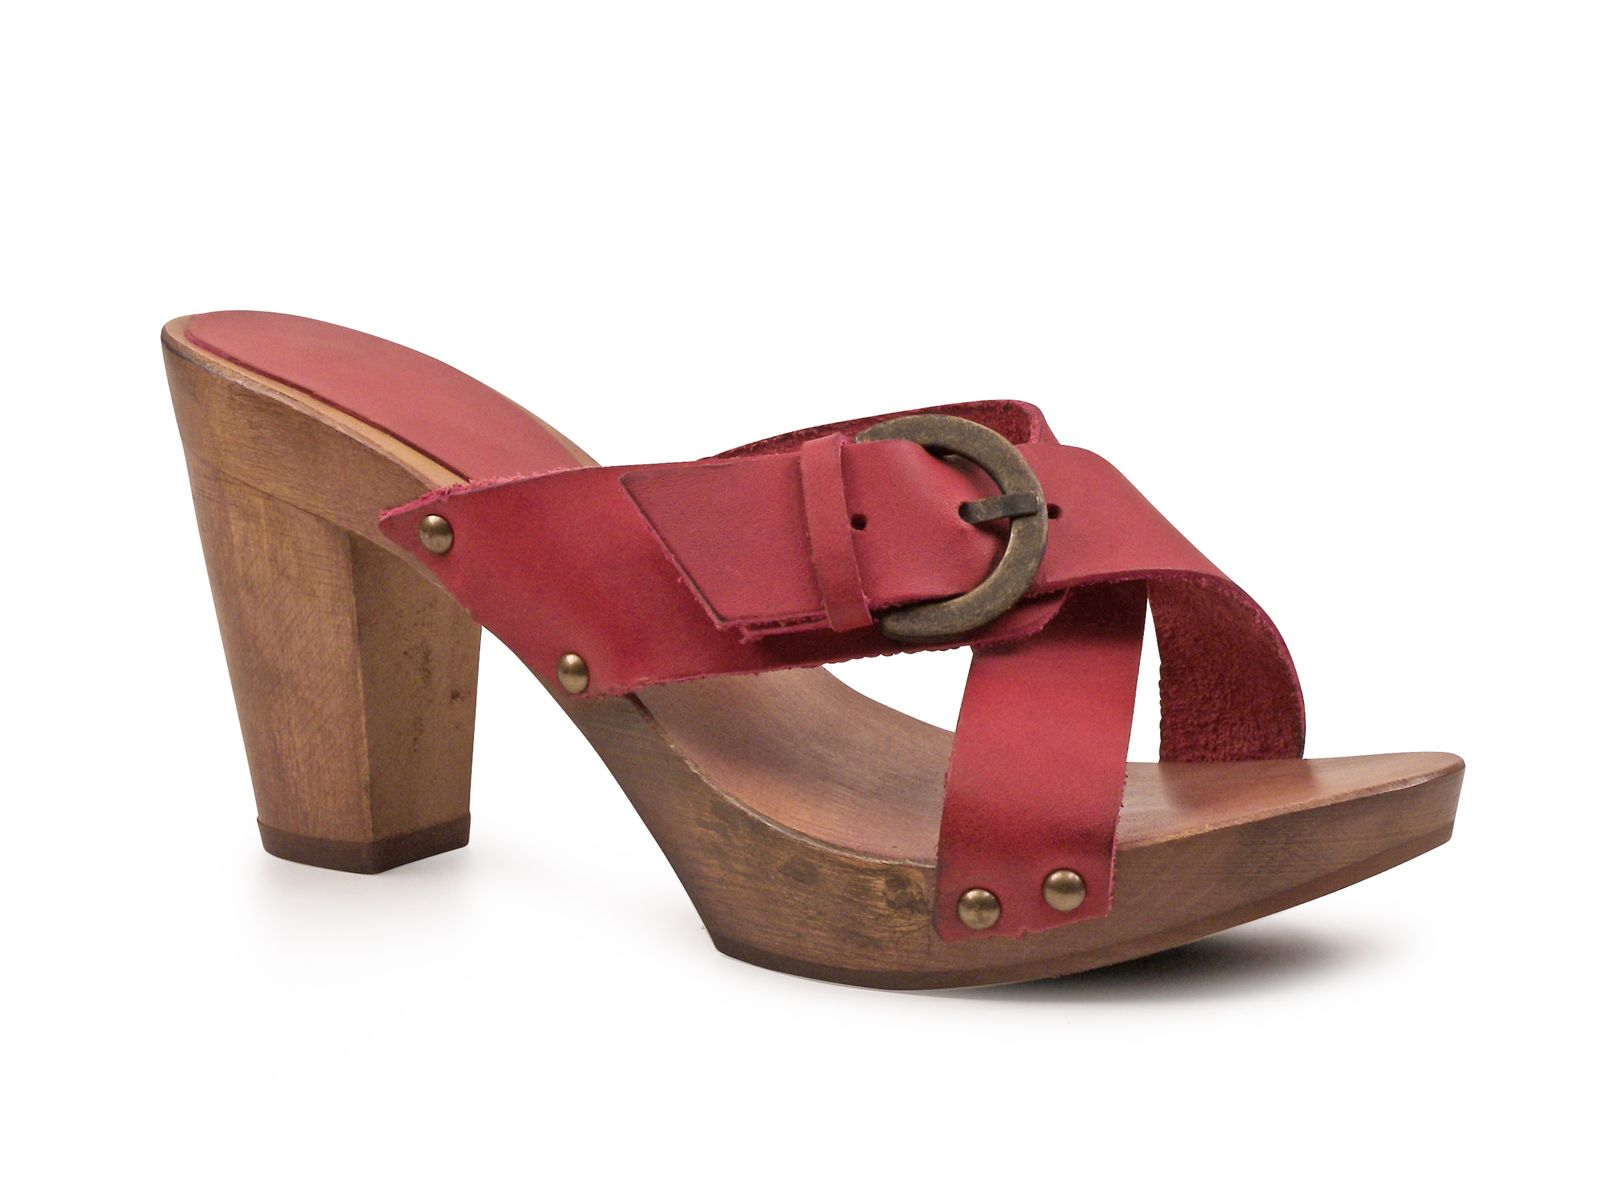 cf892c49b6 Handmade women's fuchsia leather wooden heels mules | lady stuff in ...